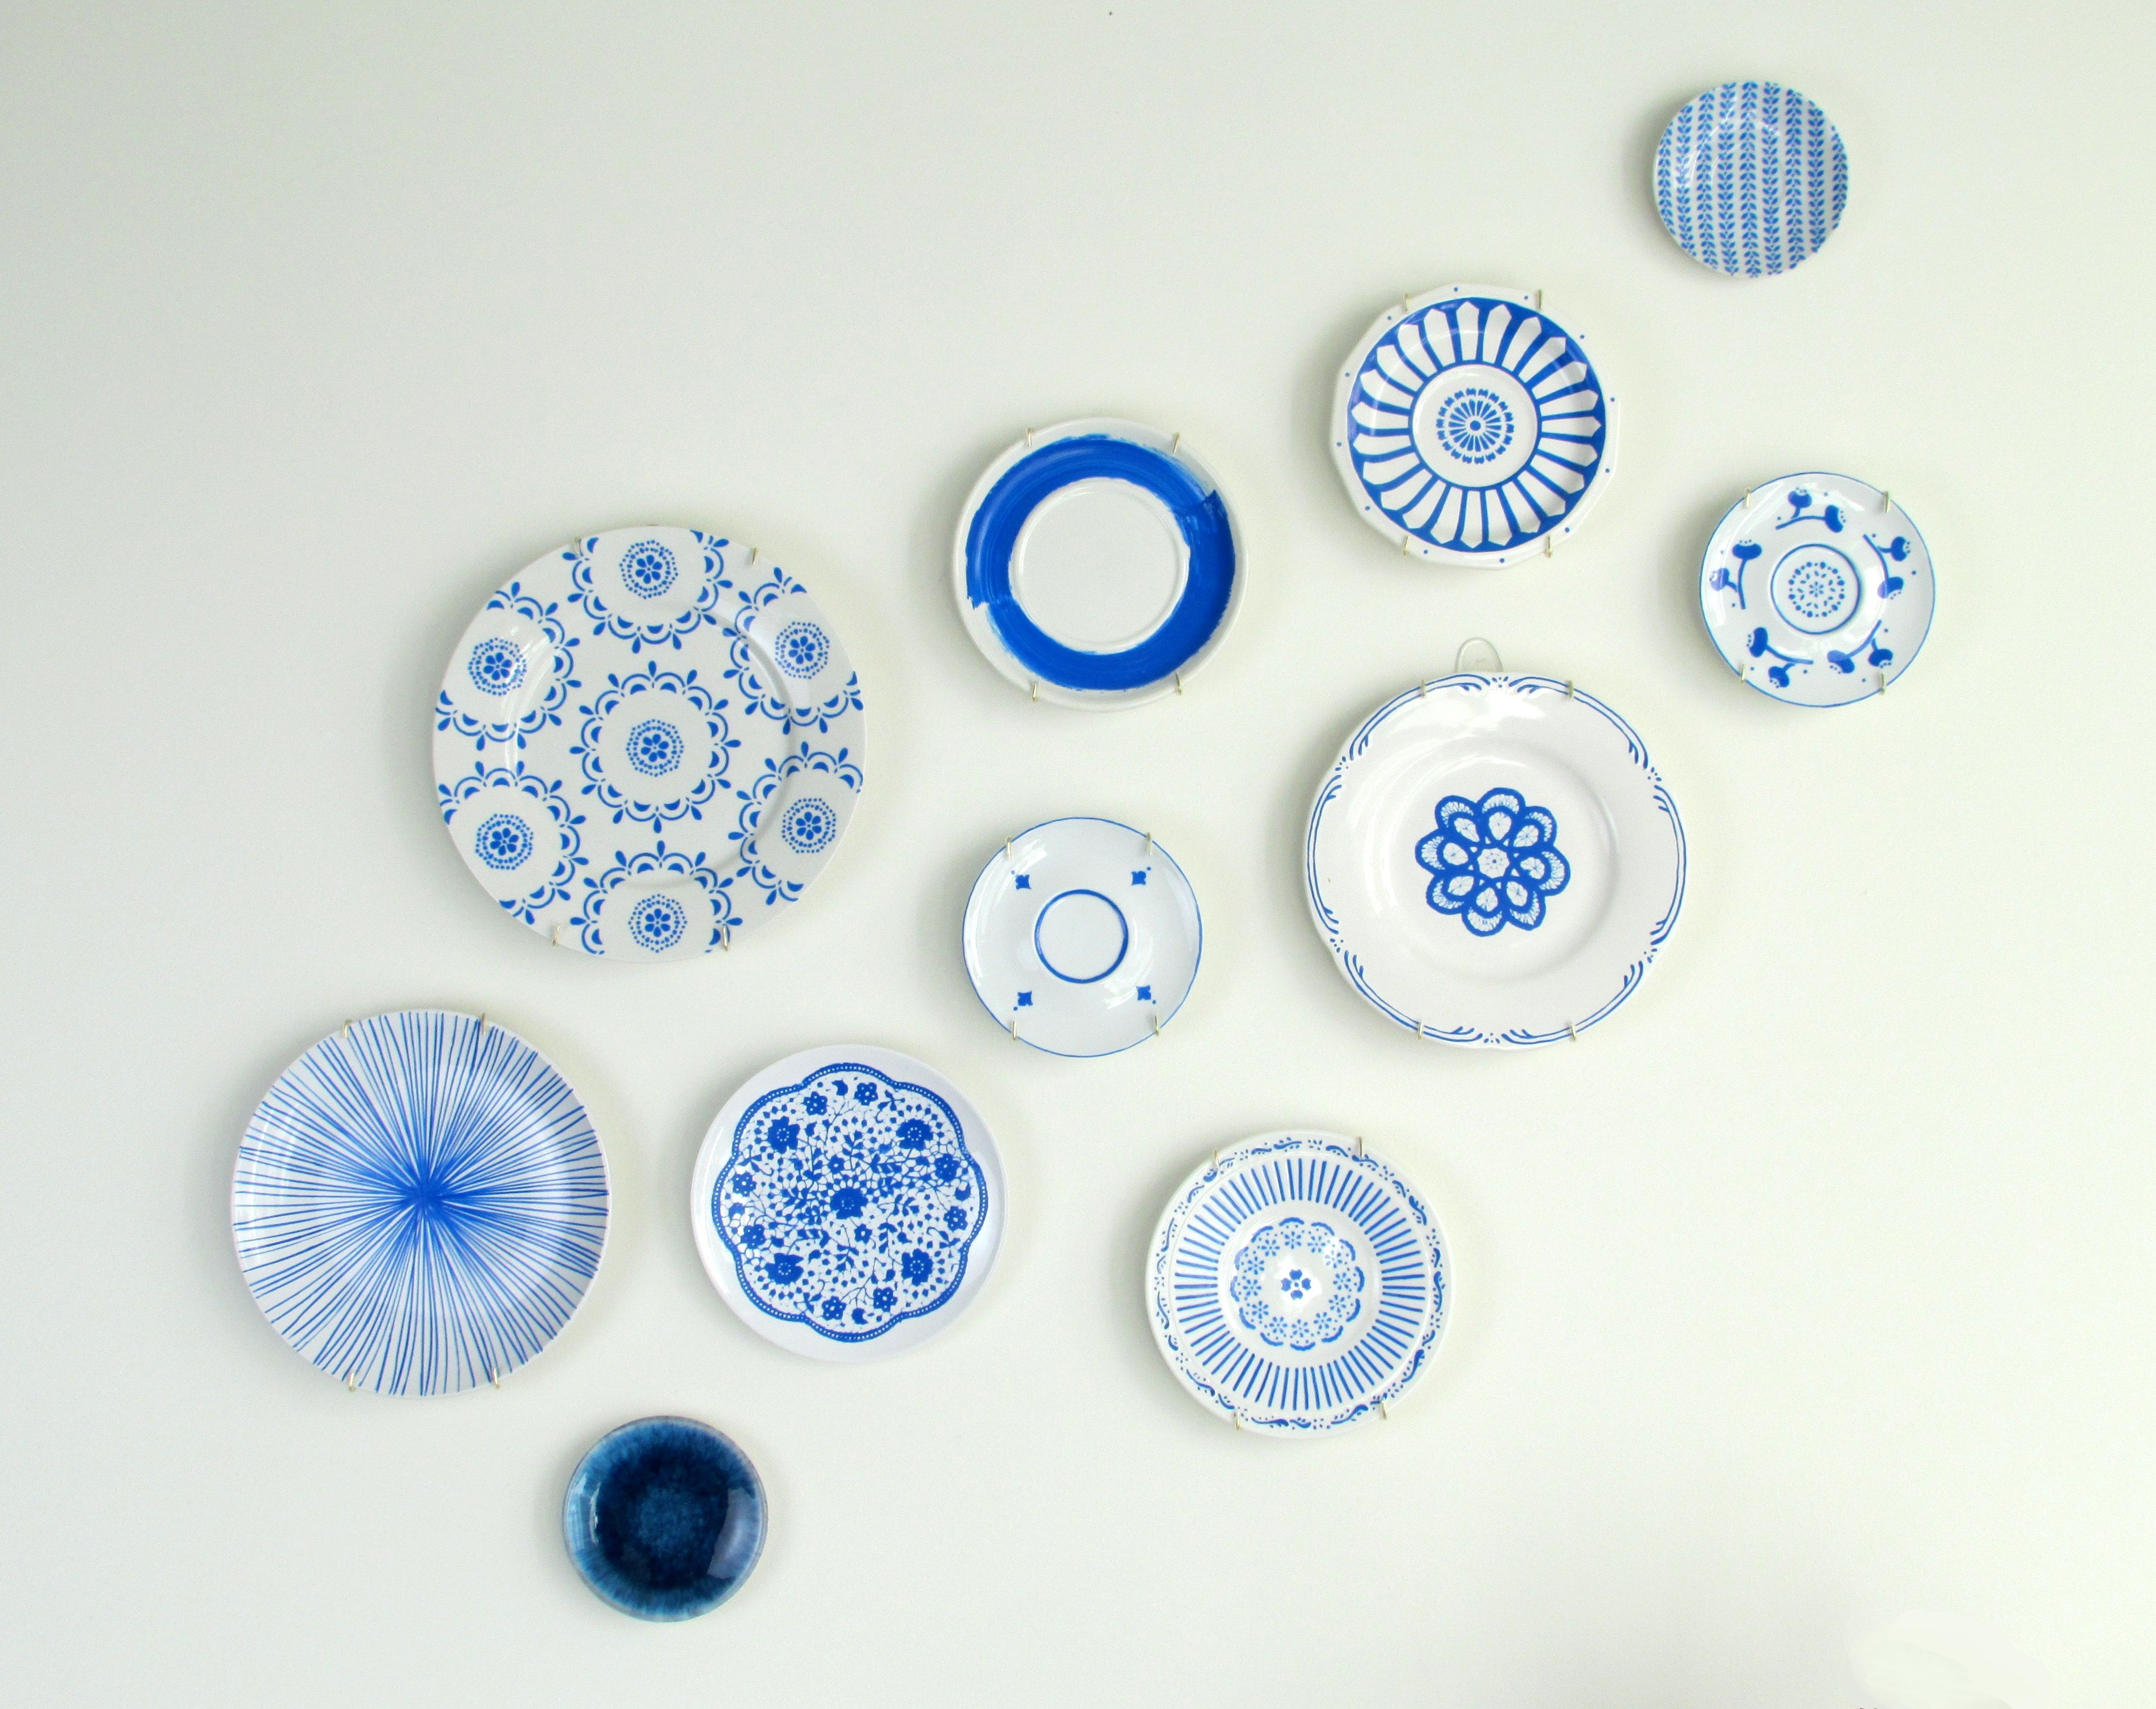 Blogger Sneak Peek Hand Painted Blue White Plates